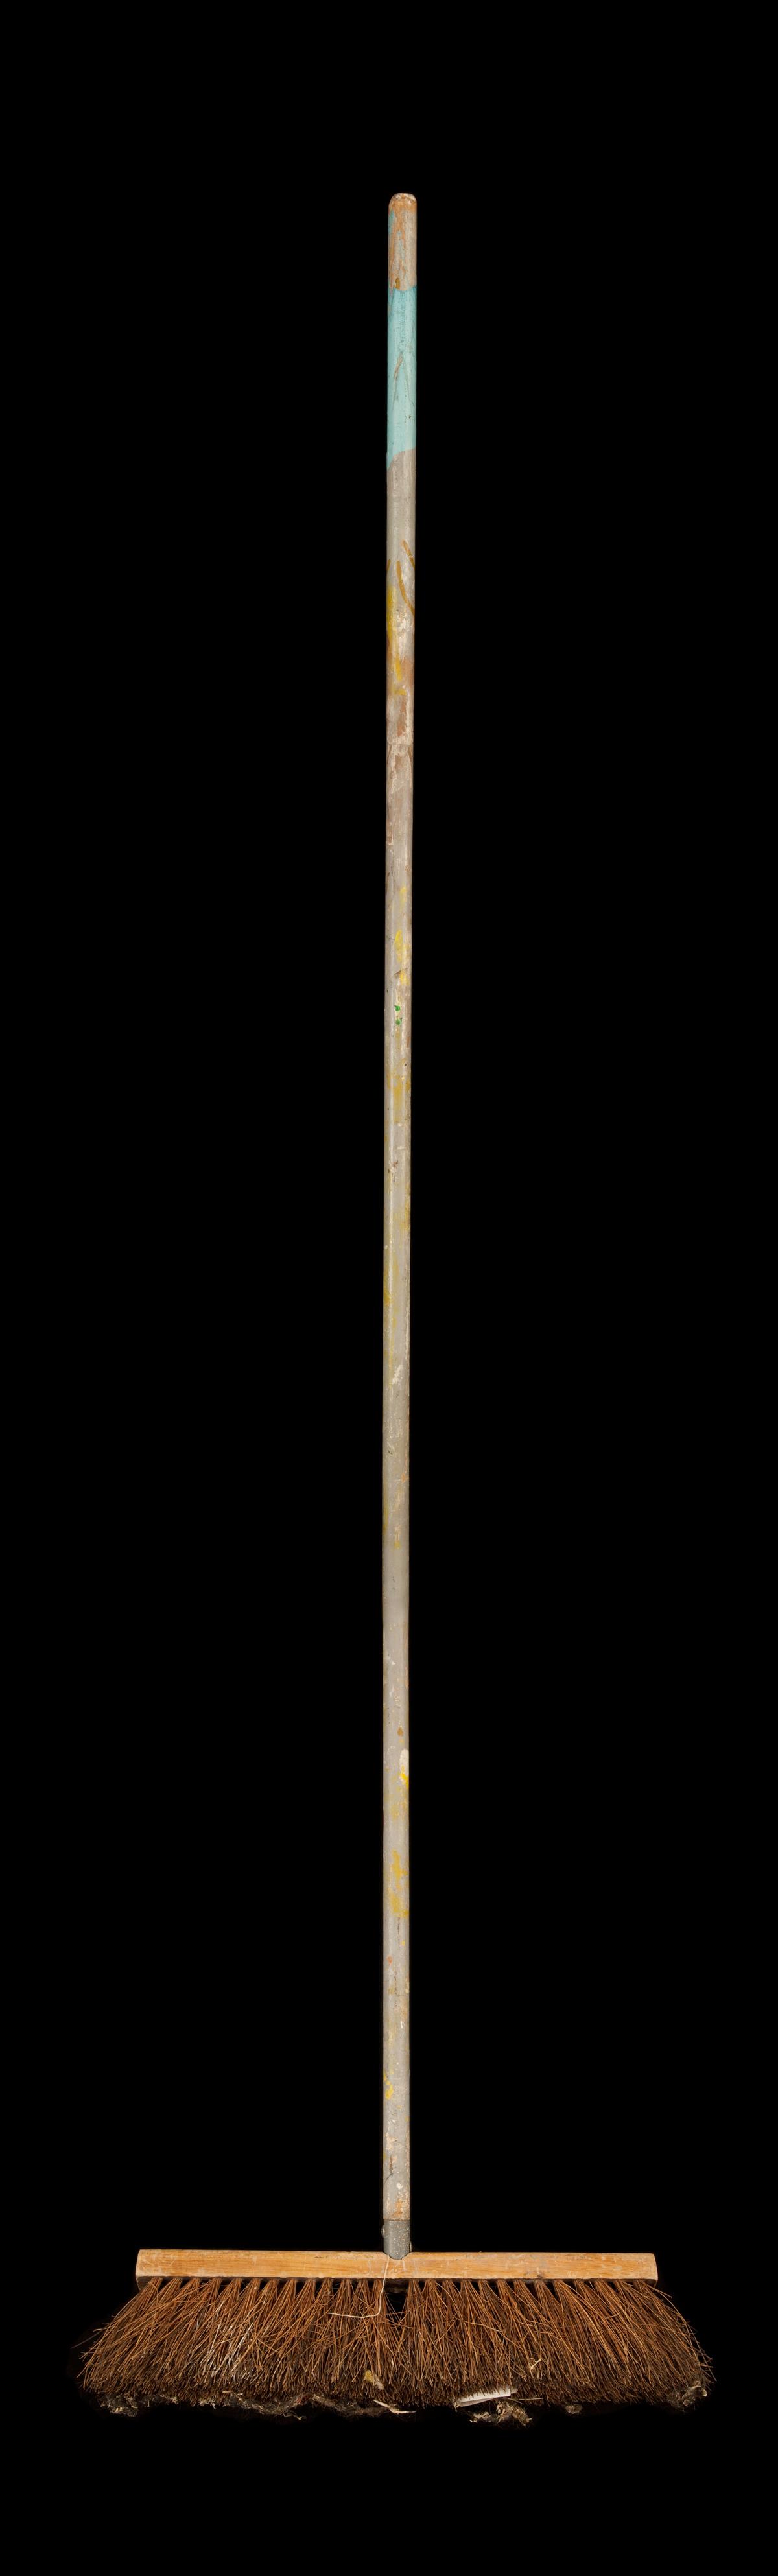 Broom7.jpg